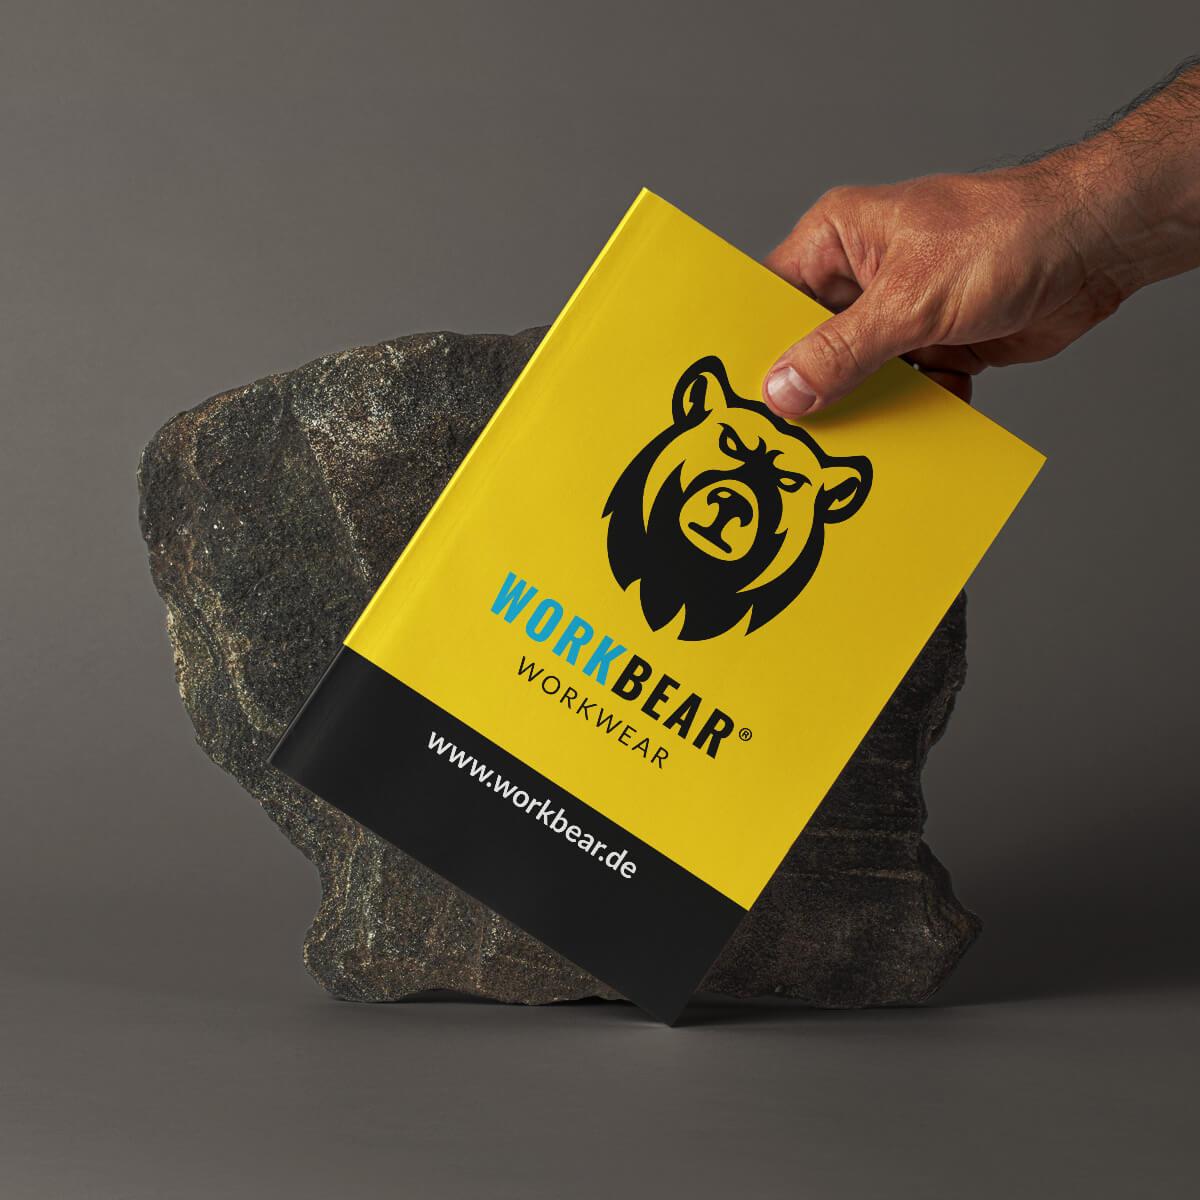 Workbear Weiden & Cham Grafikdesign / Corporate Design